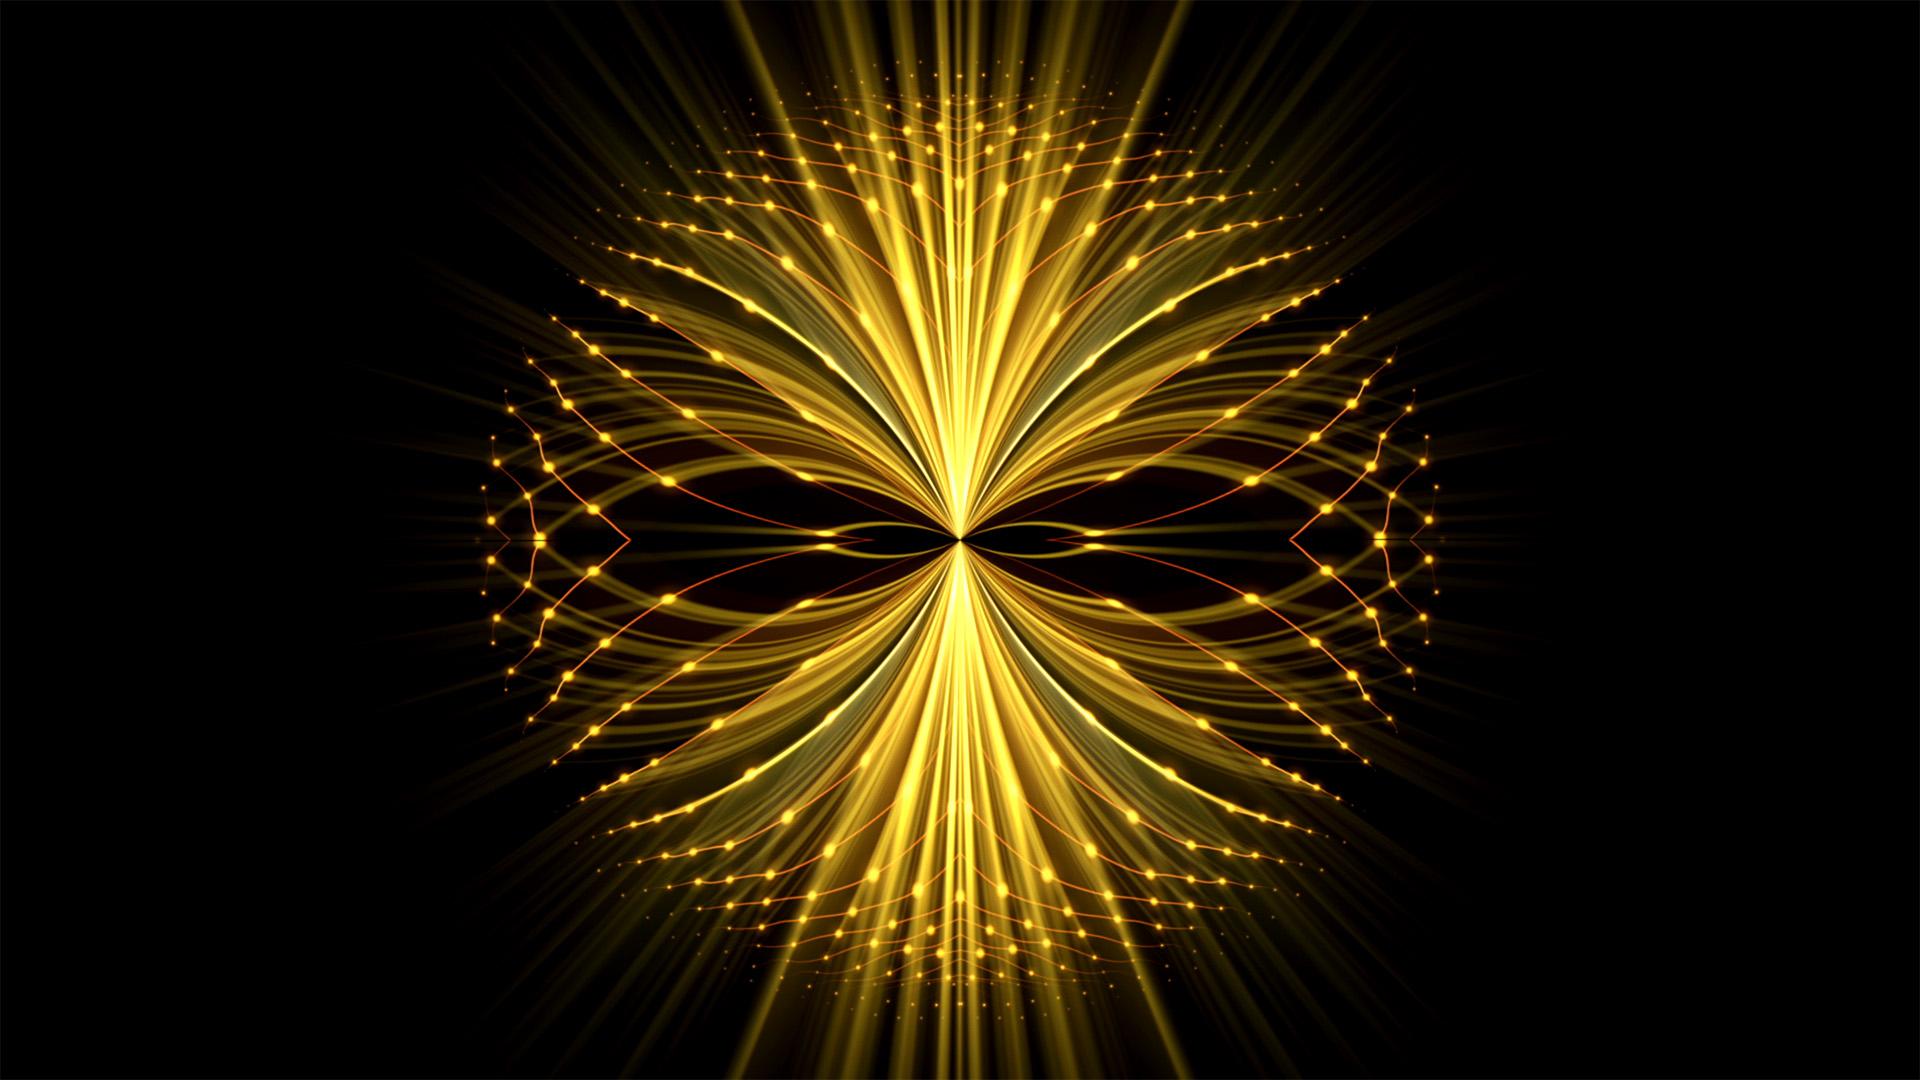 vj loops video sun event rays light